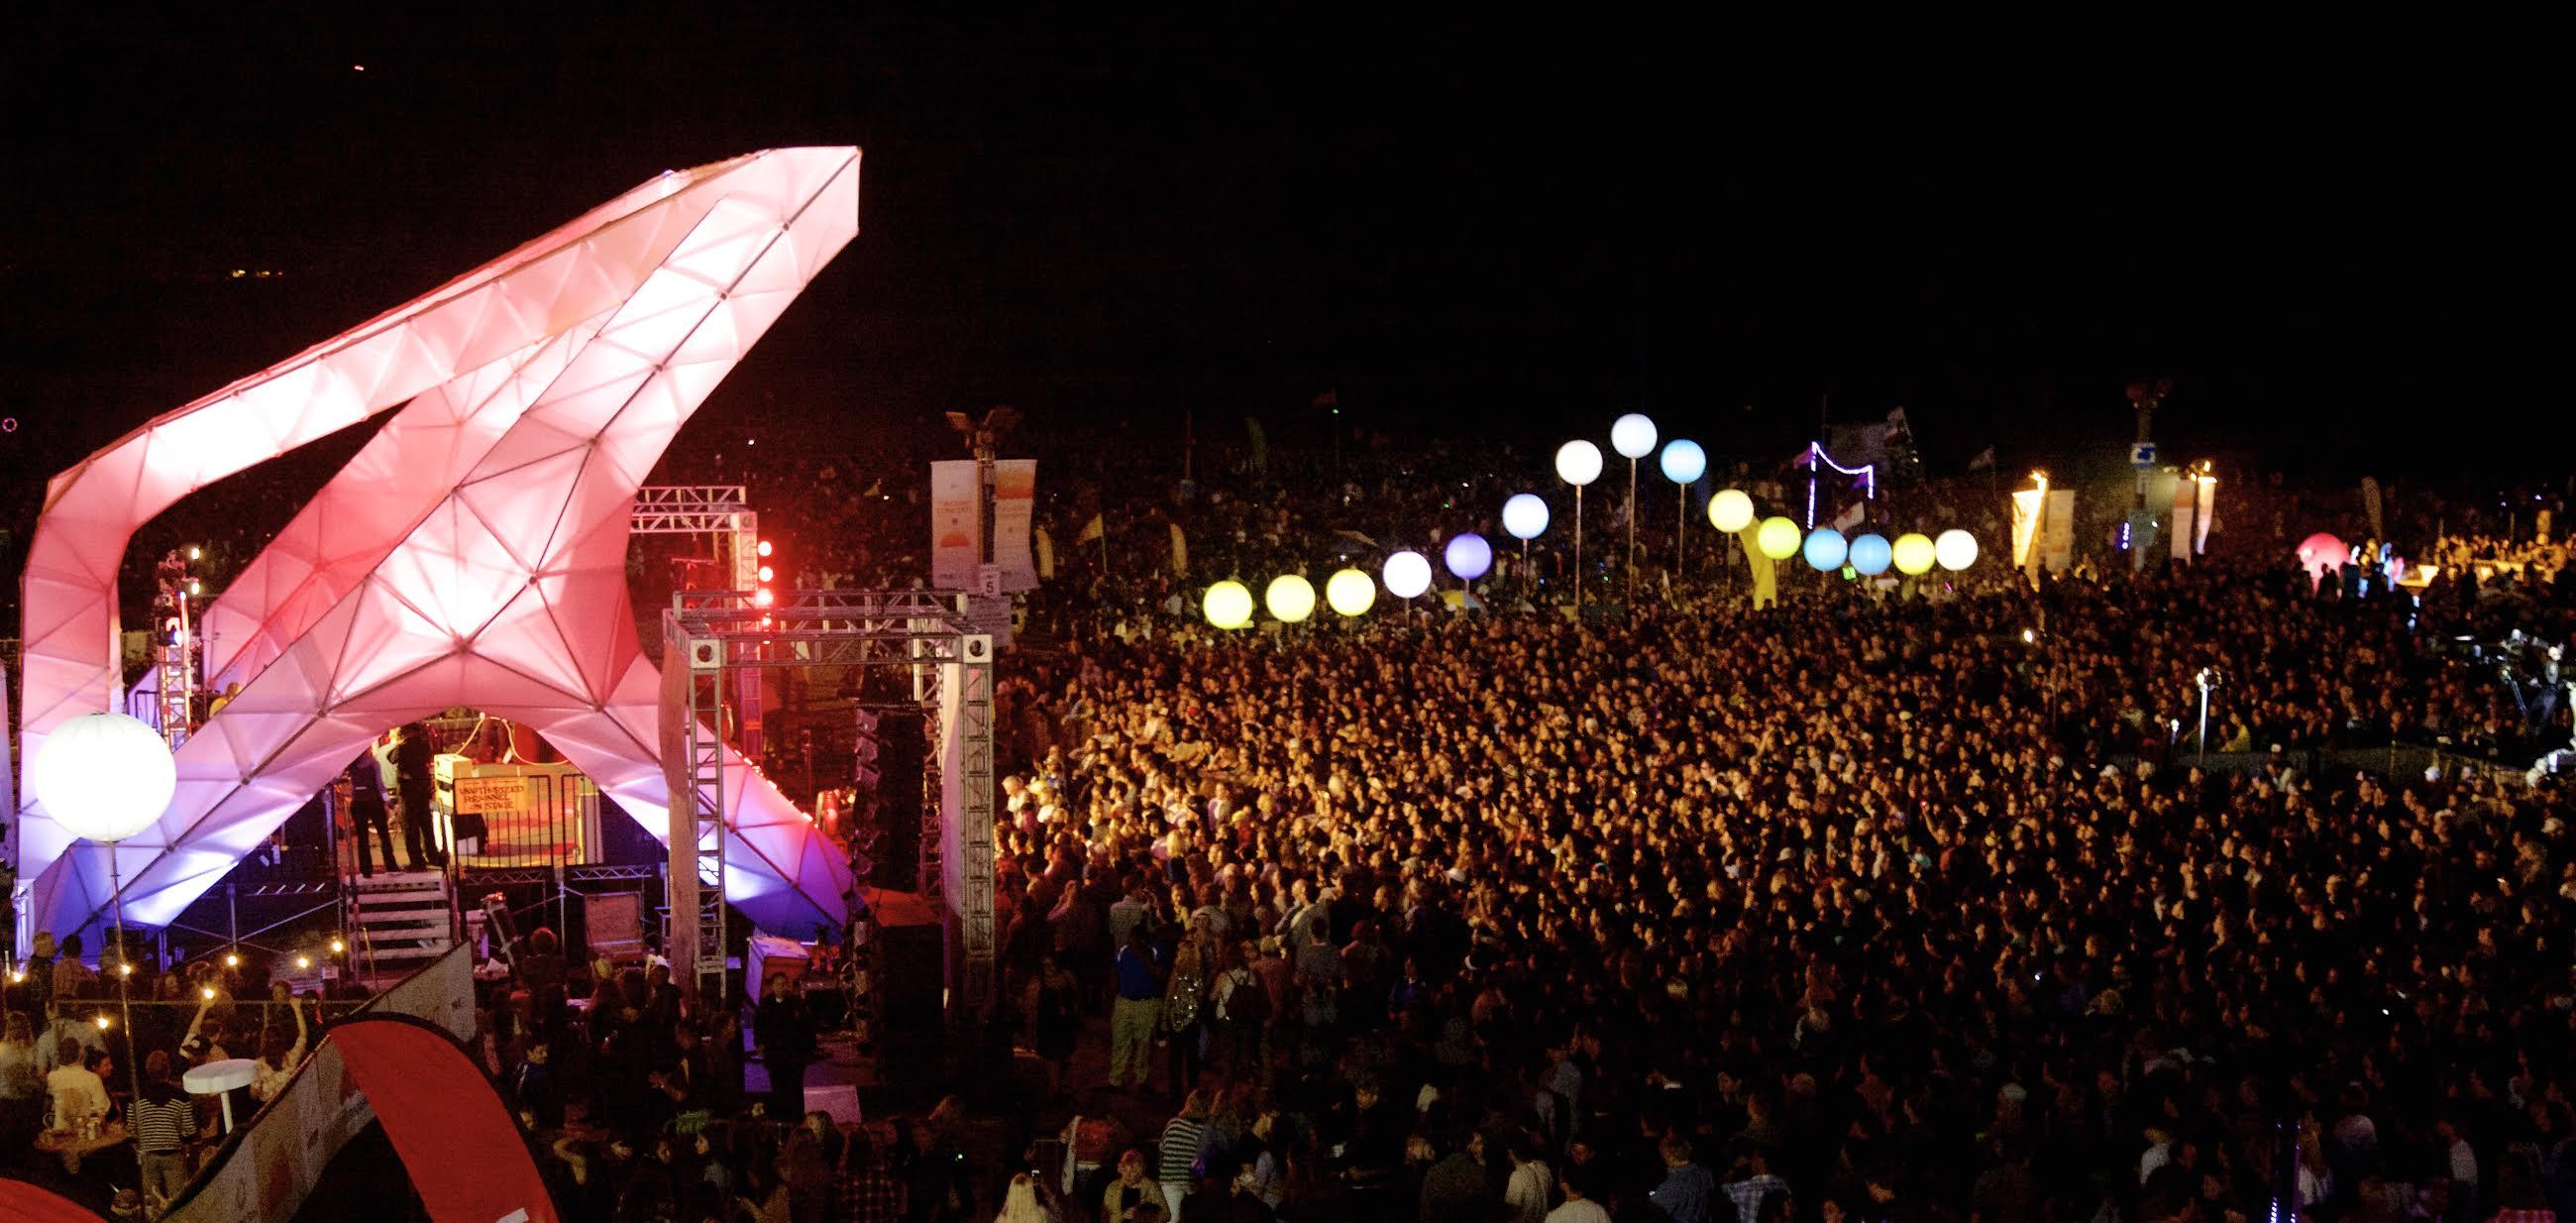 Twilight Concert Series on the Santa Monica Pier